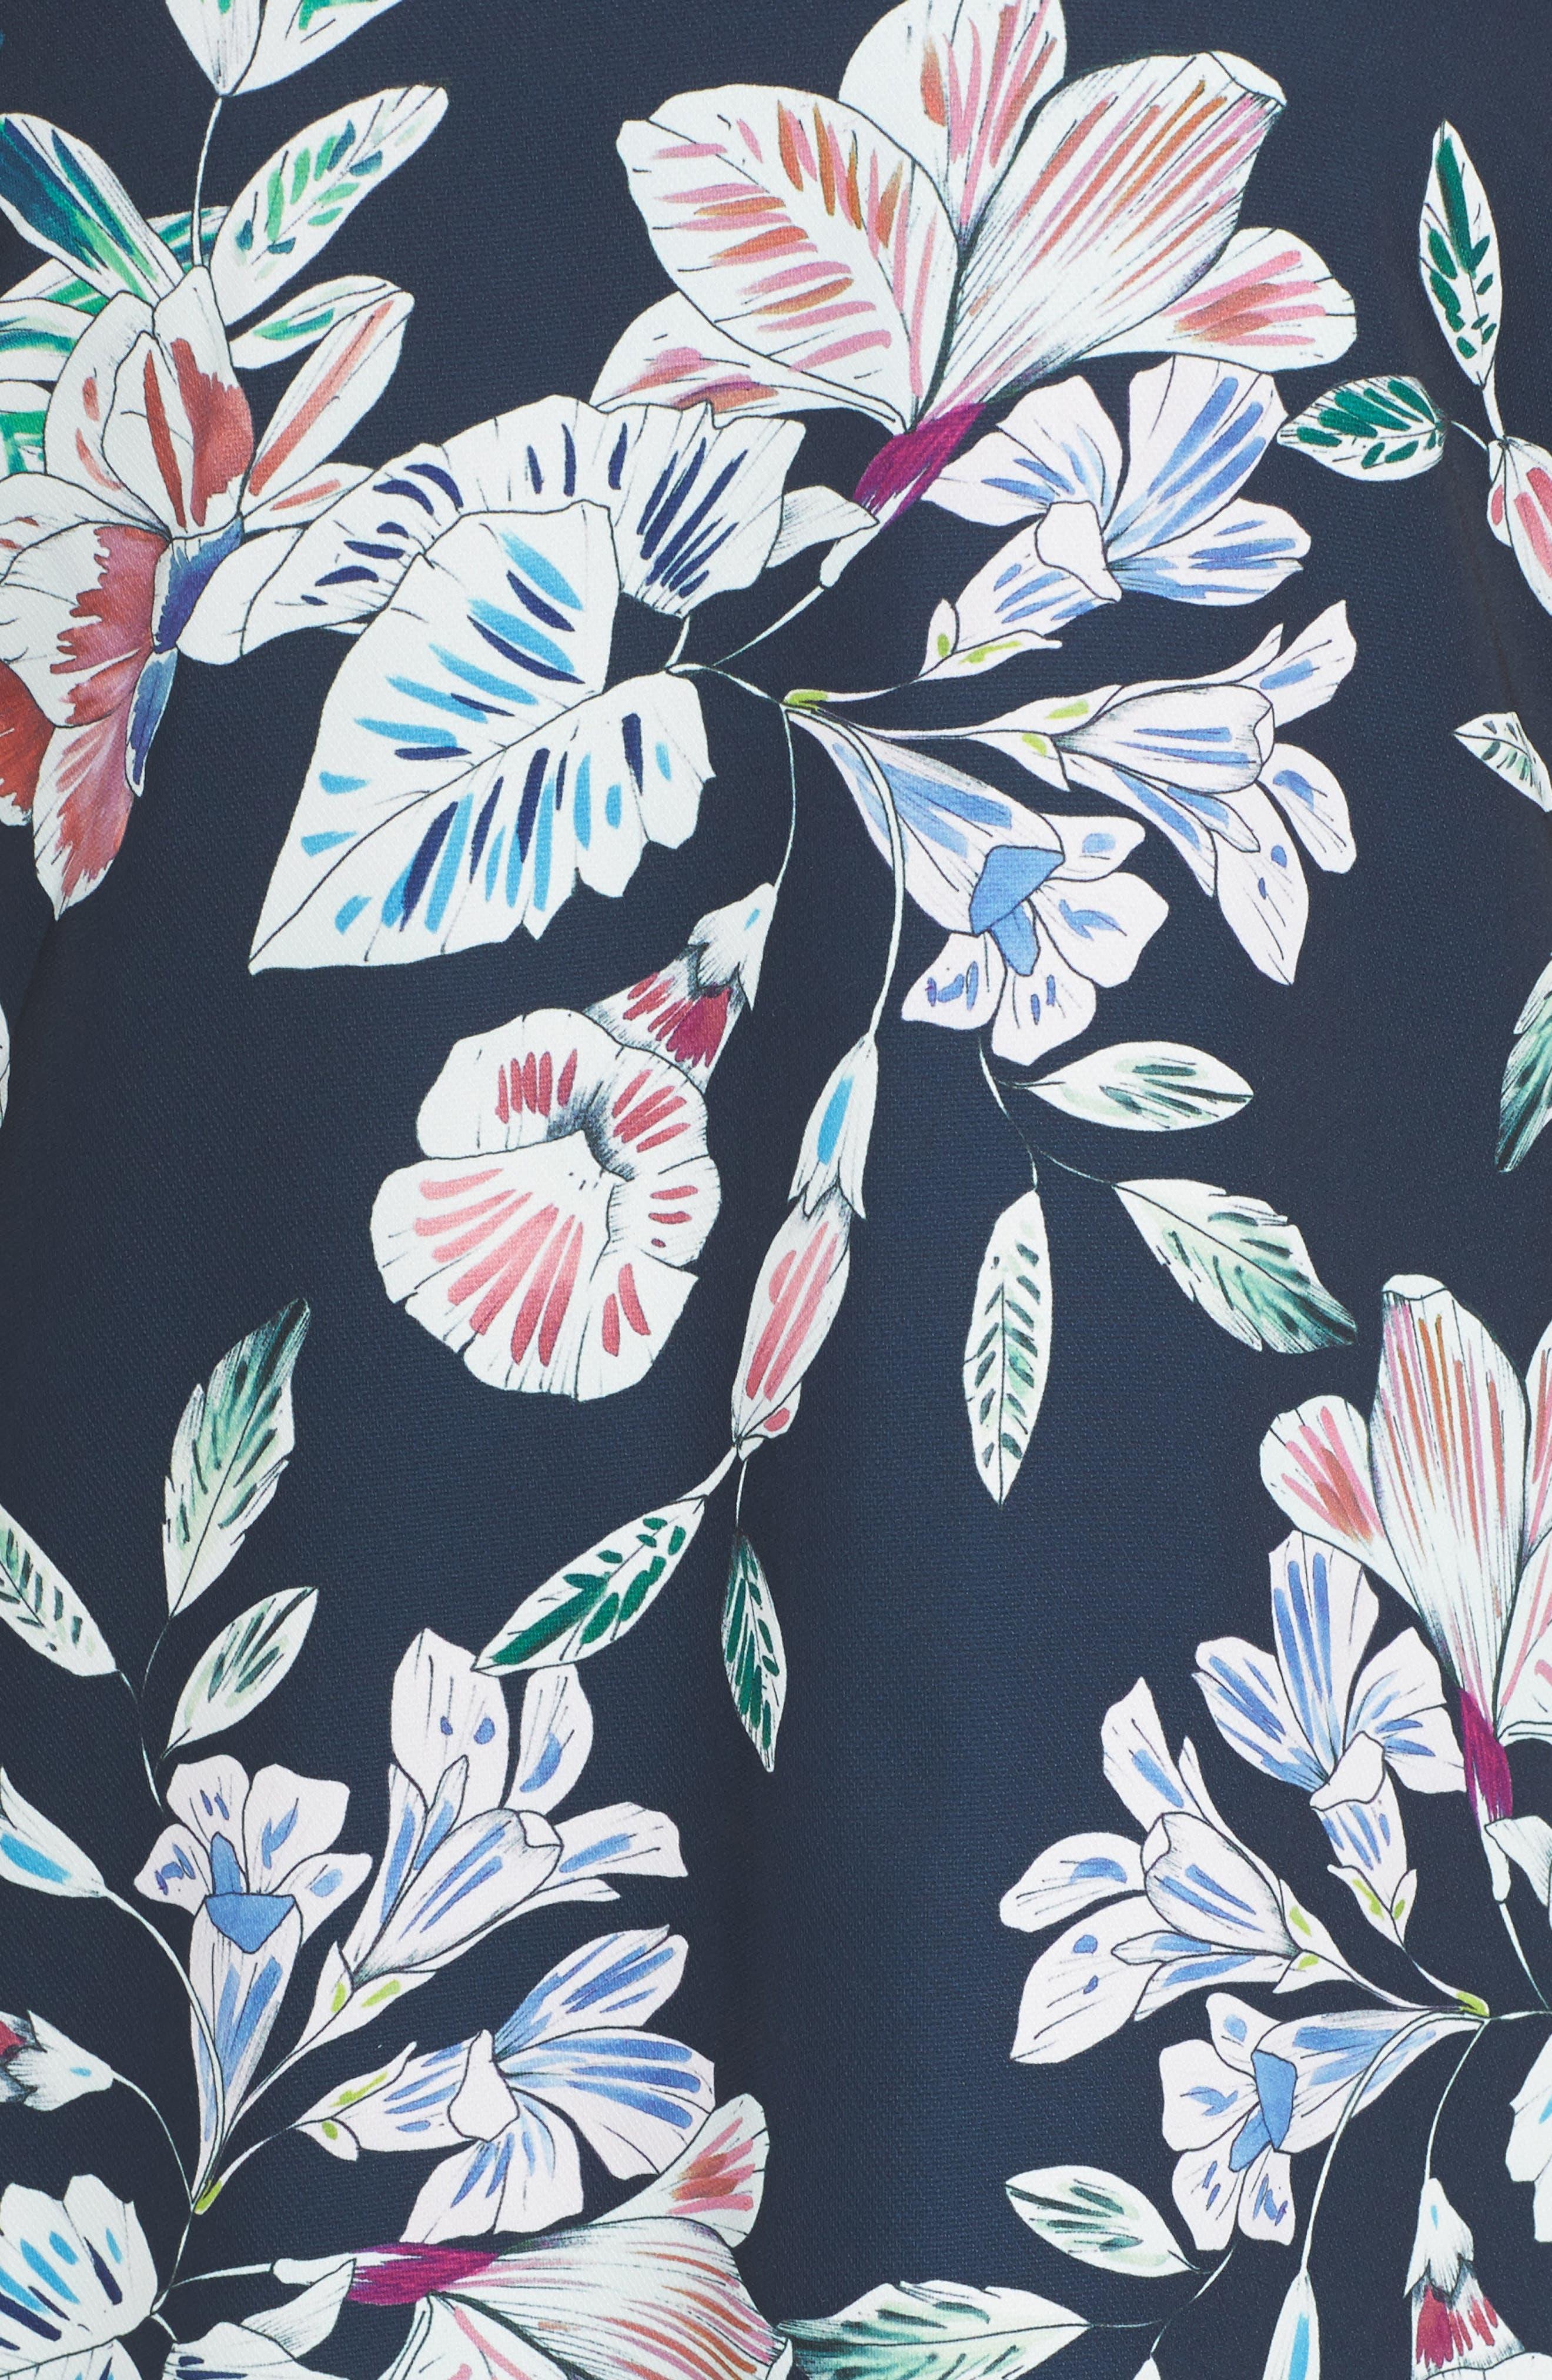 Phantom Floral Shift Dress,                             Alternate thumbnail 5, color,                             001